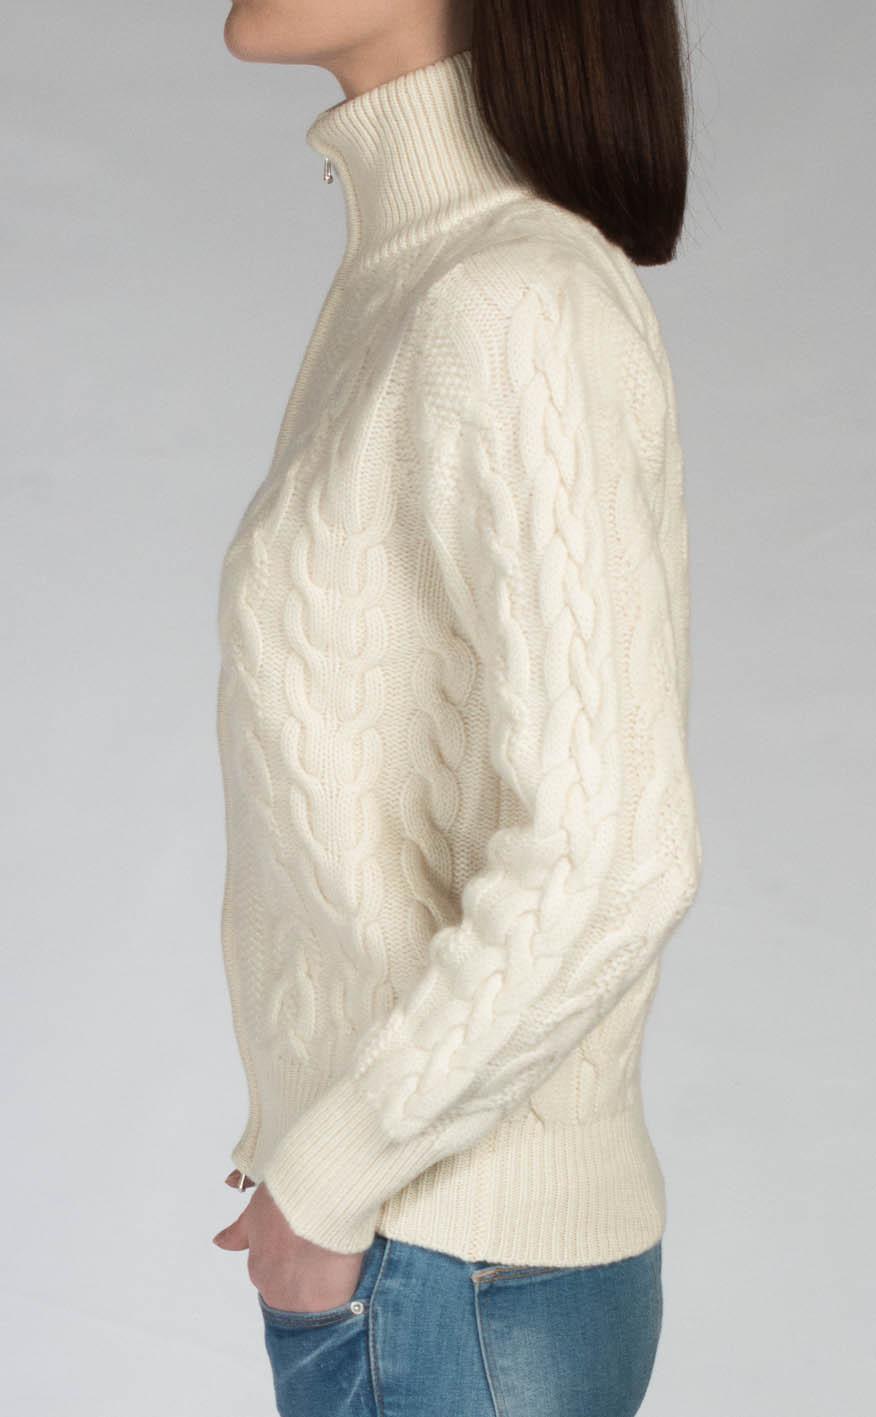 Colour: White Undyed